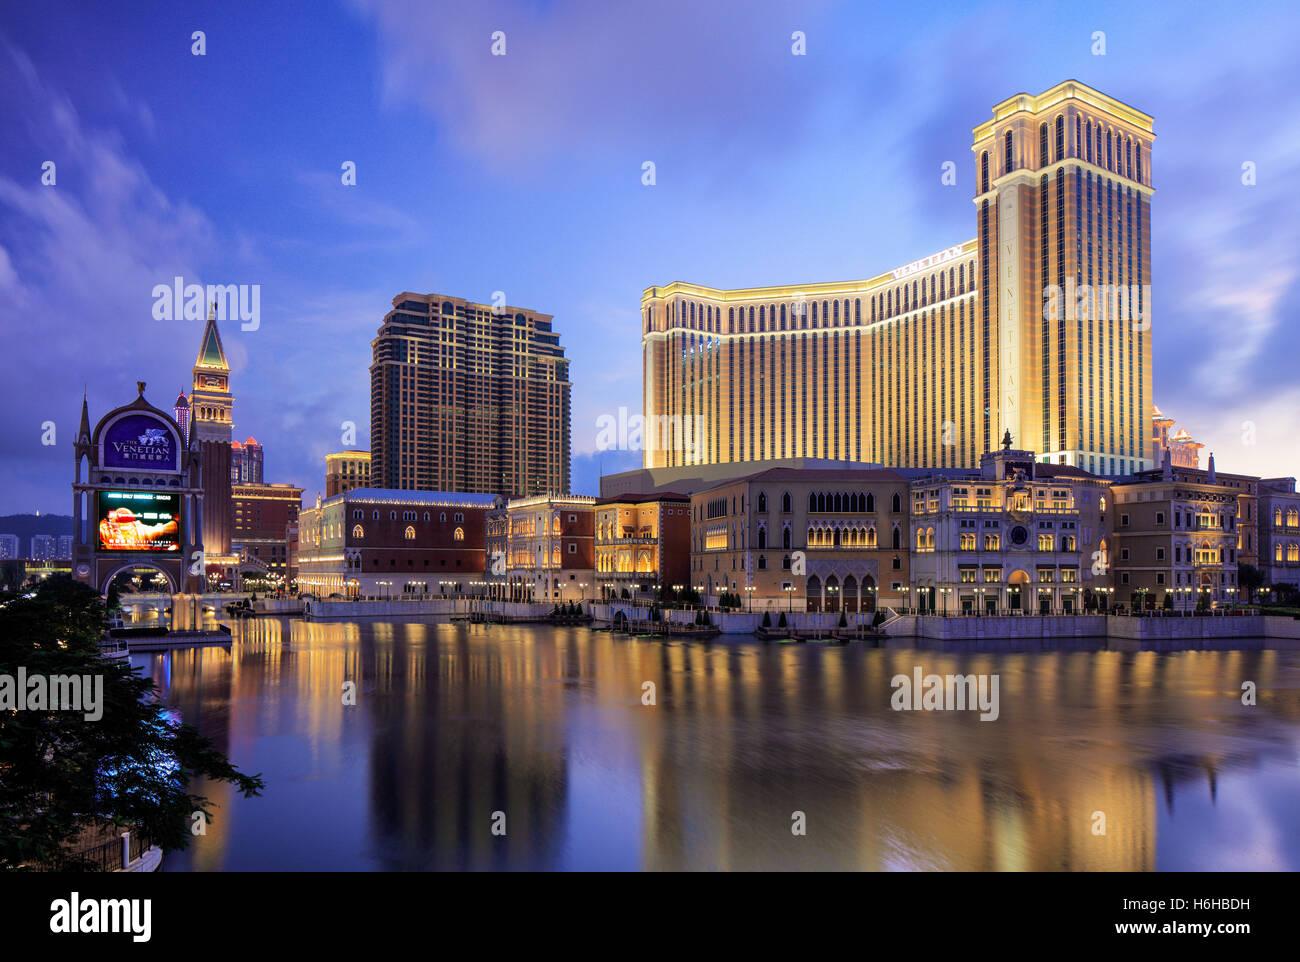 Le Venetian Hotel and Casino, Cotai, Macao Photo Stock